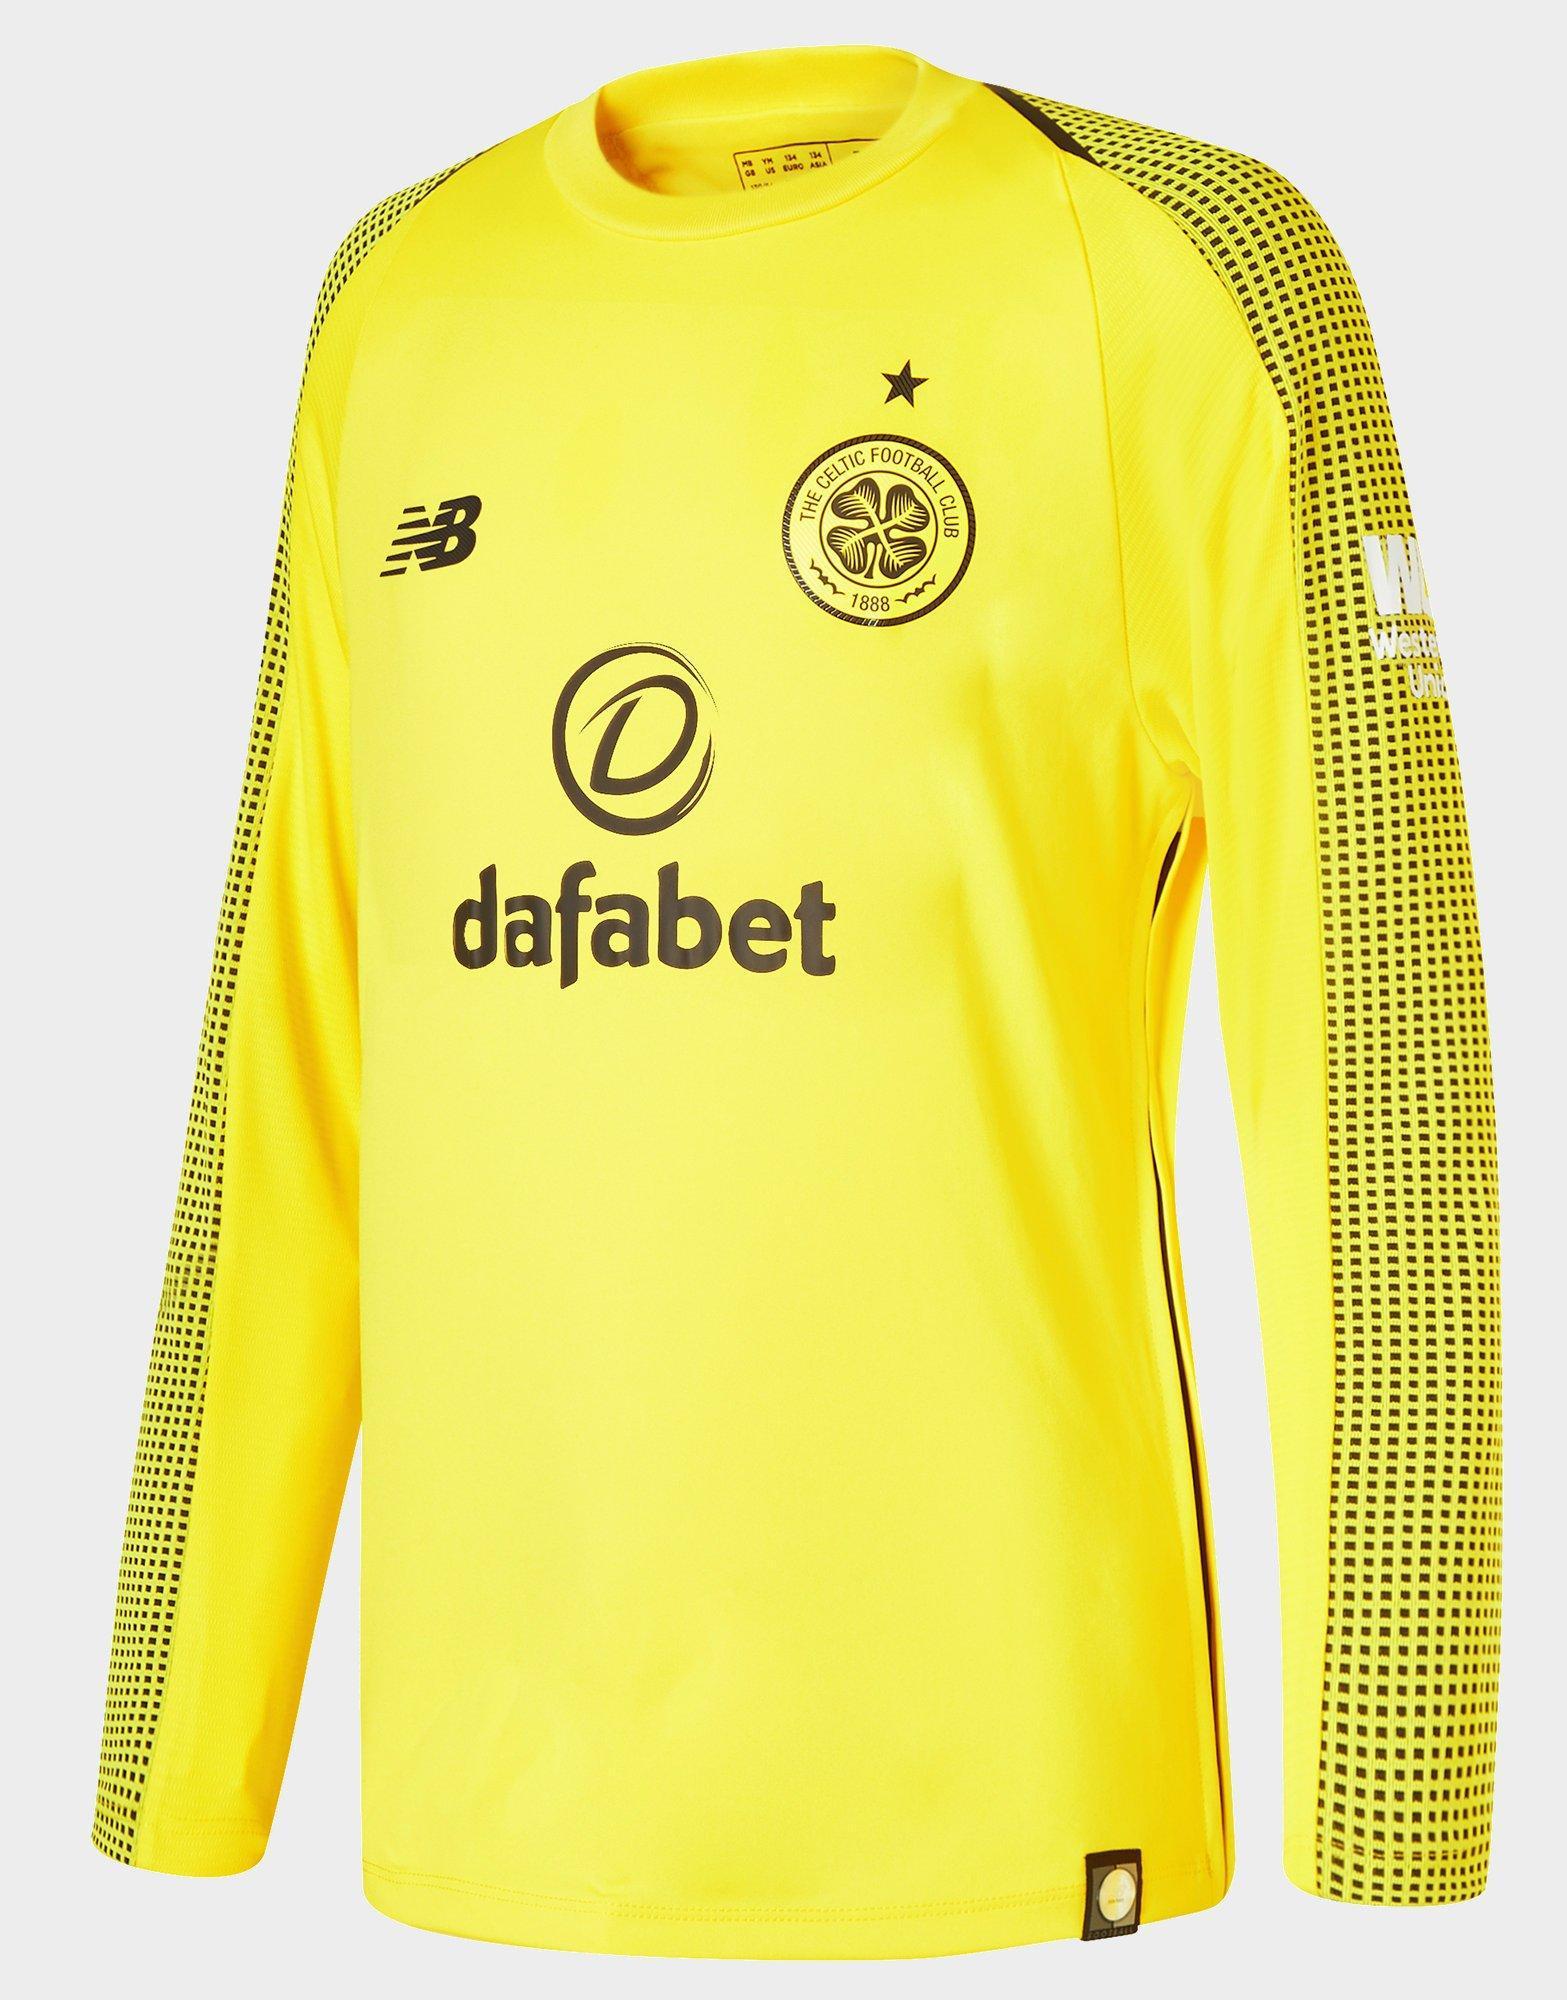 b20776842 celtic fc away jersey 17 18  new balance. mens yellow celtic fc home gk  long sleeve jersey